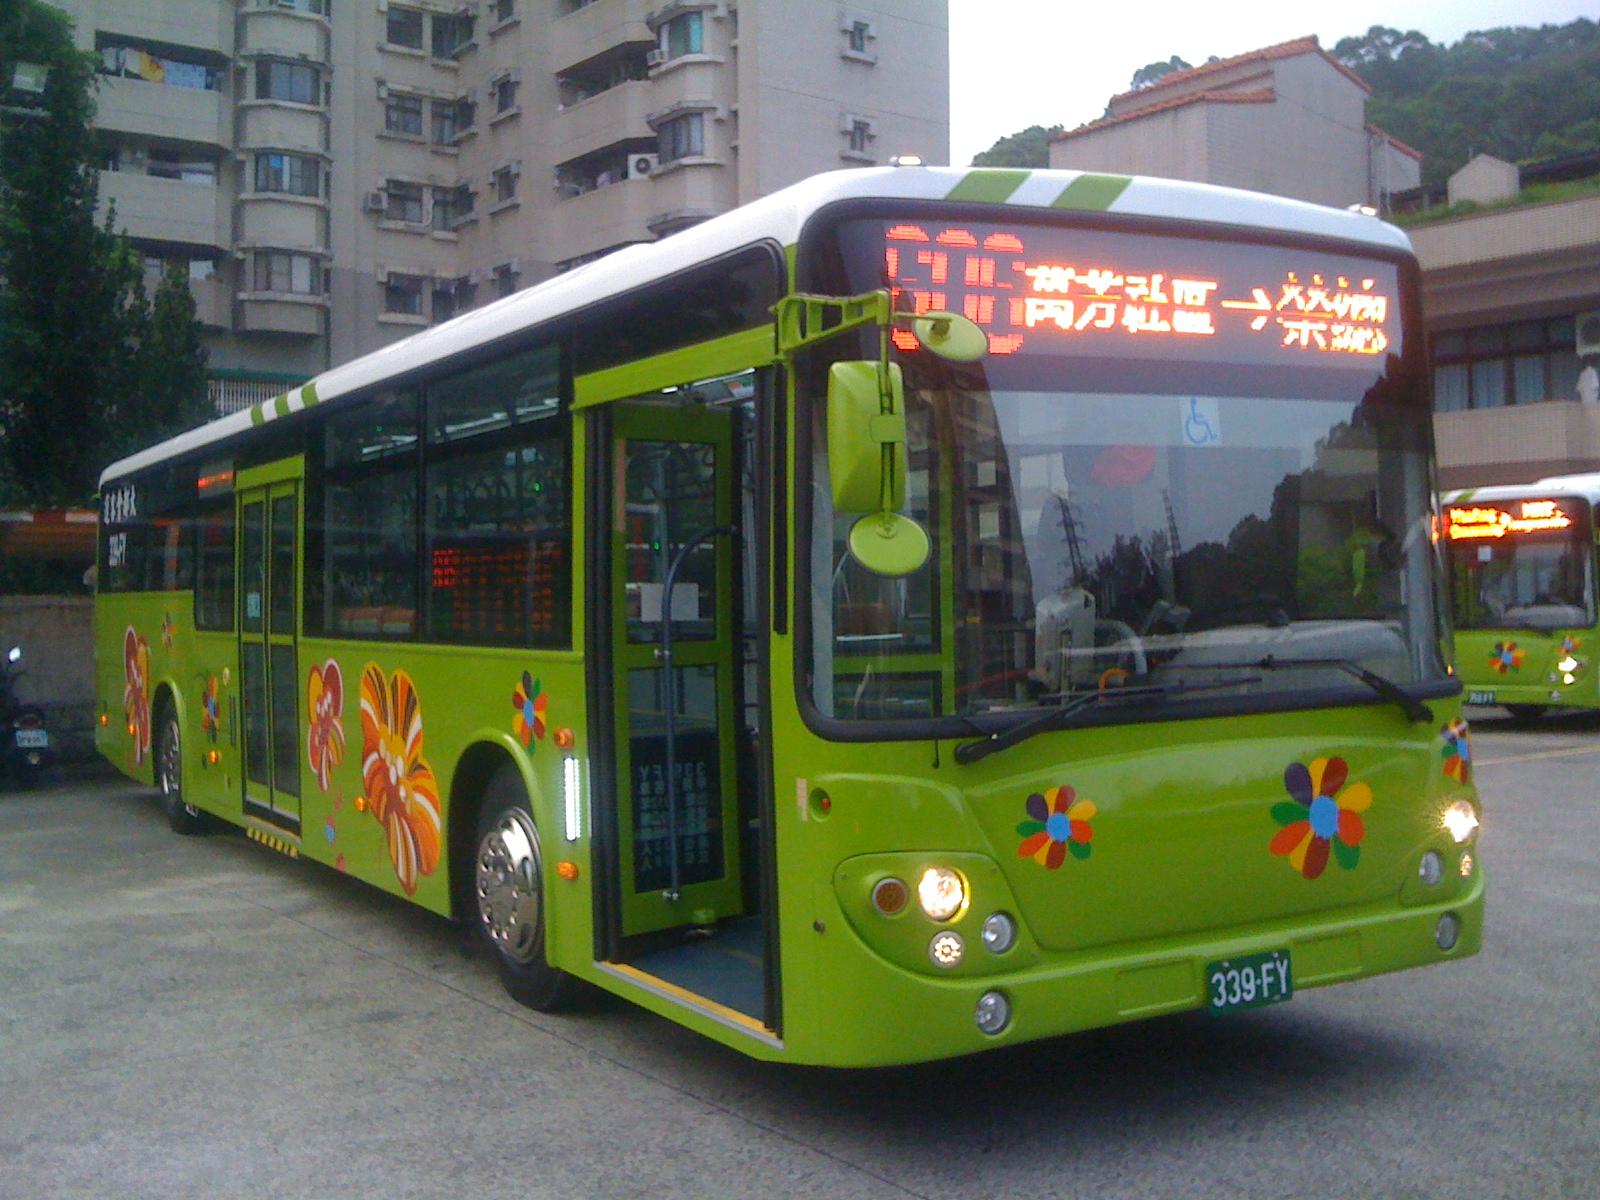 File:606 339-FY 車頭.JPG - Wikimedia Commons